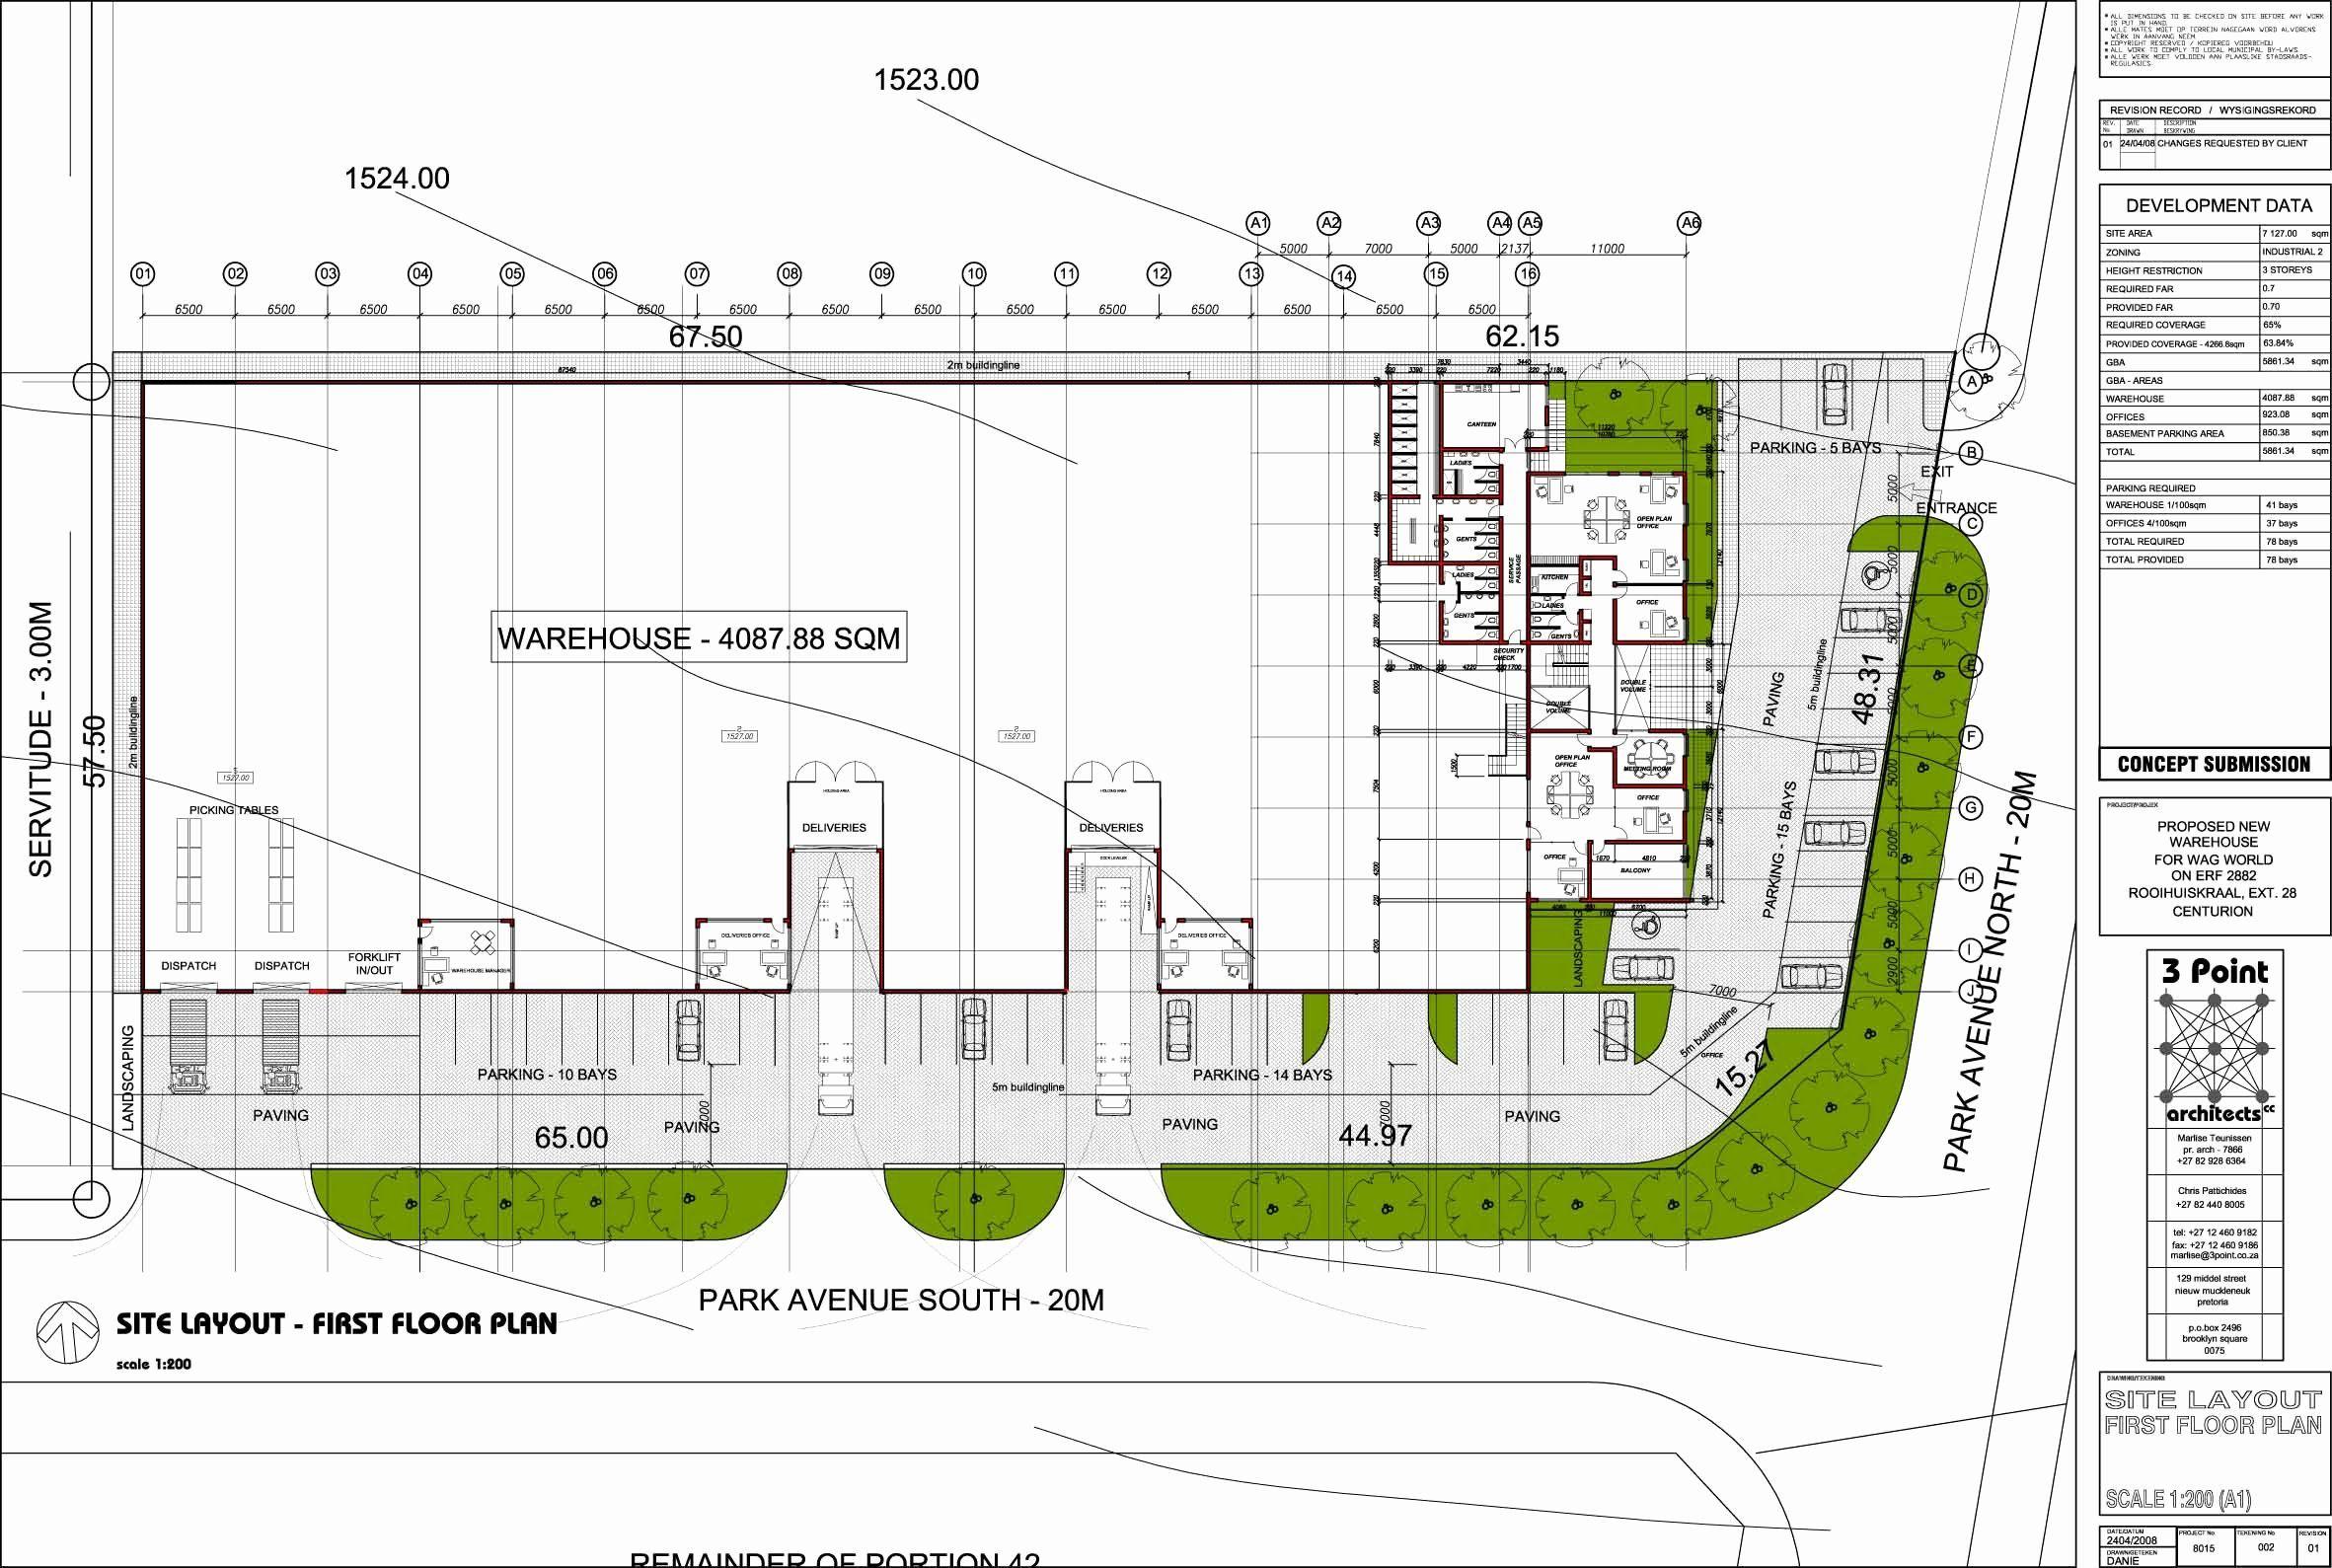 Warehouse Floor Plan Template Lovely Warehouse Building Plans Modern House Plan Modern In 2020 Warehouse Floor Plan Warehouse Design Warehouse Floor